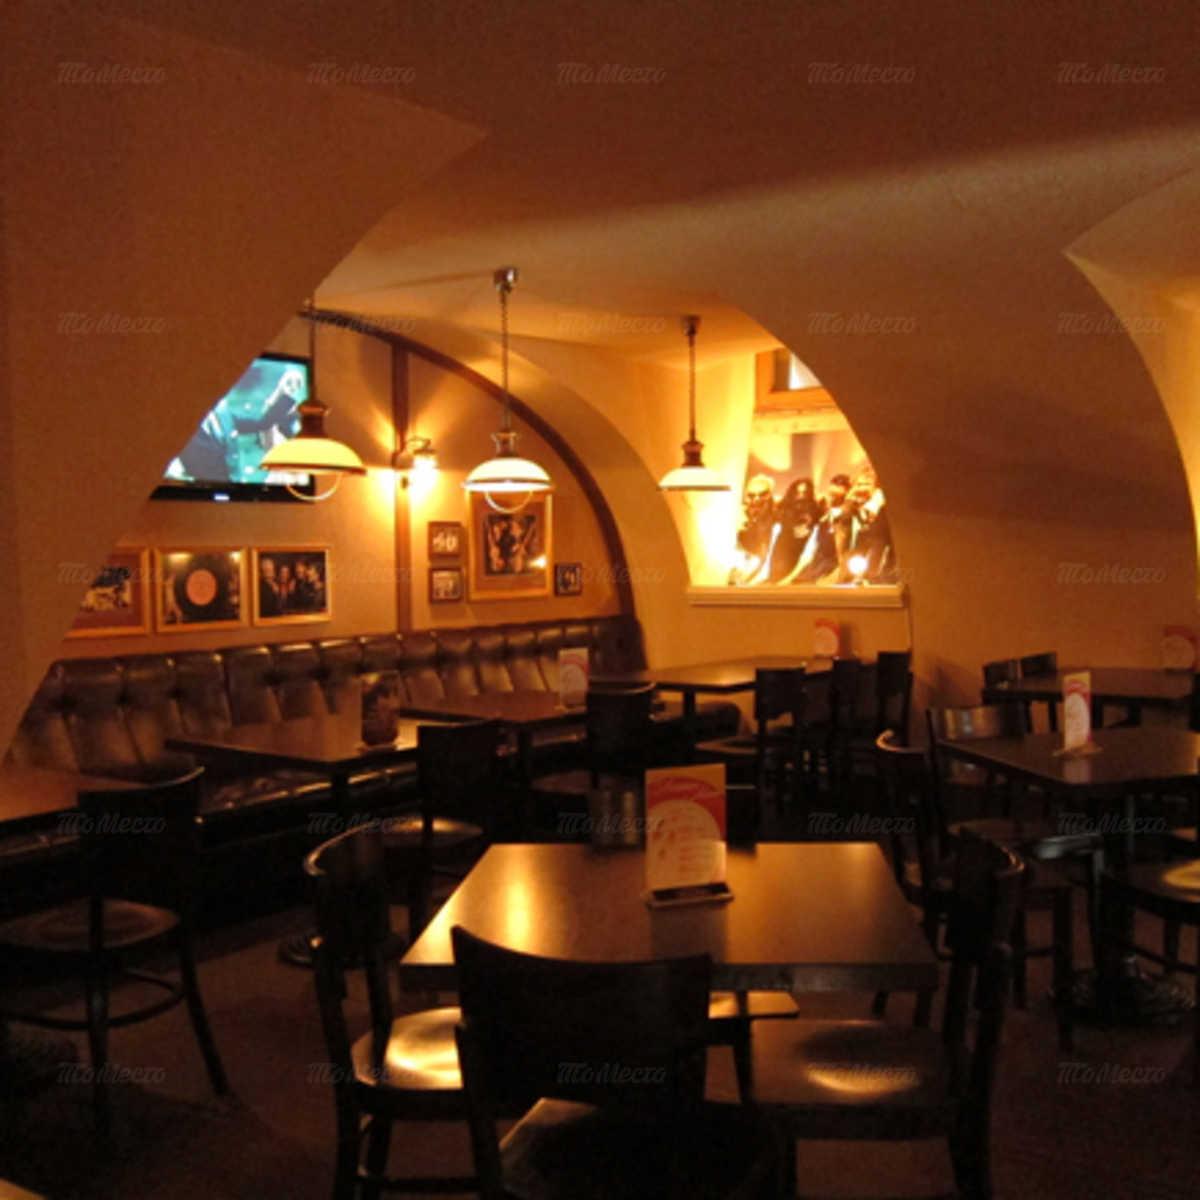 Паб Рок паб (Rock Pub) на Невском проспекте